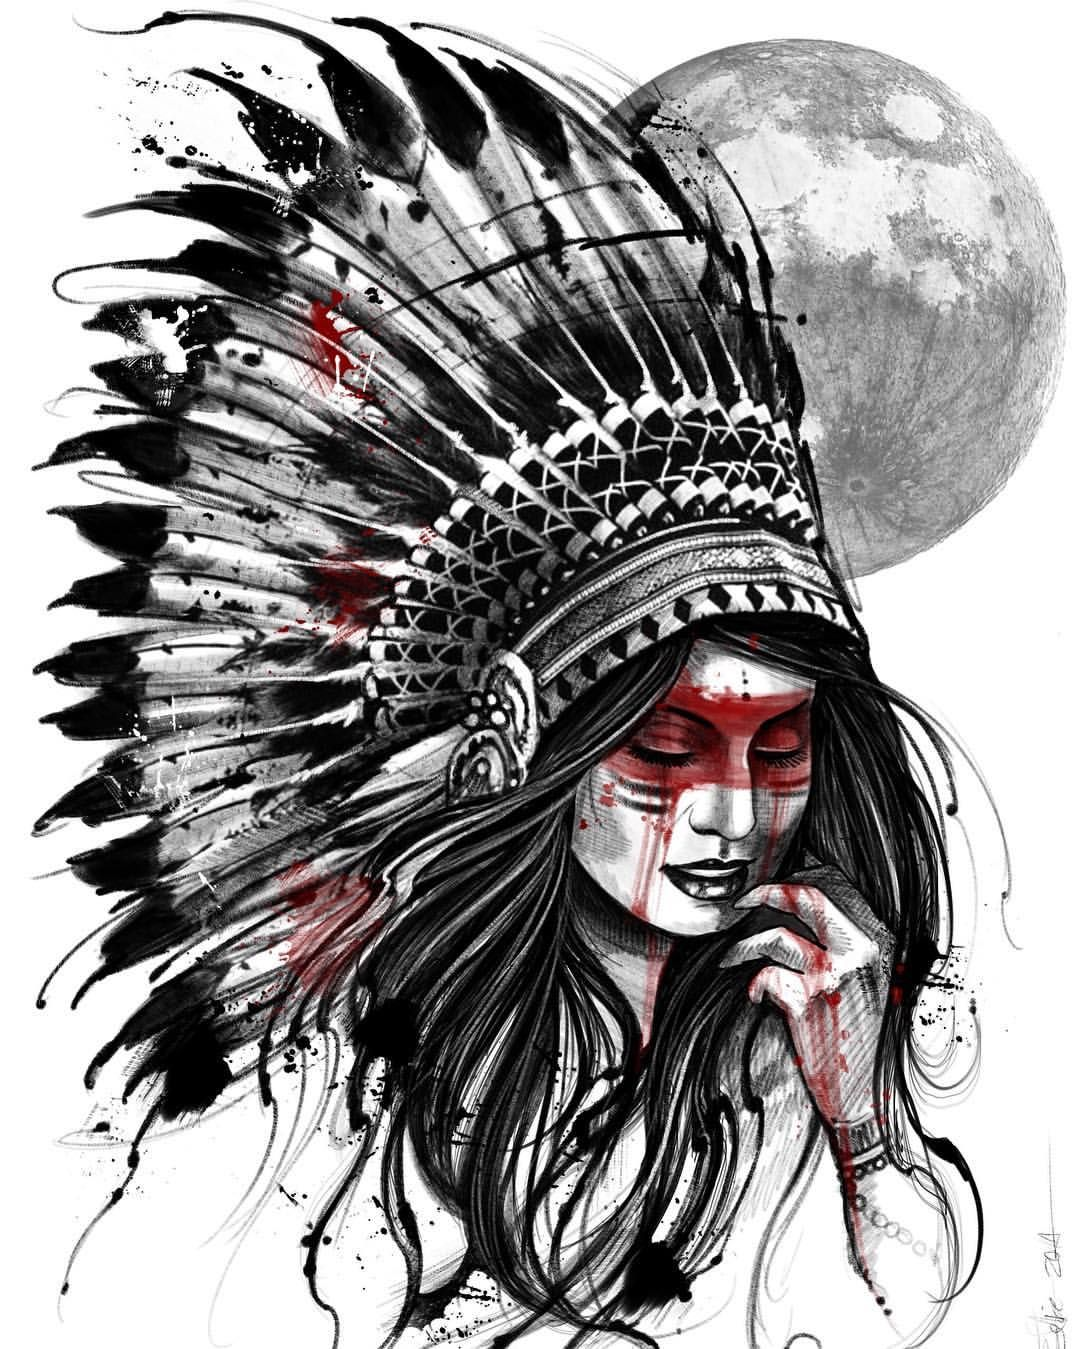 E Essa Tatuagens Indigenas Tatuagens Indigenas Americanas